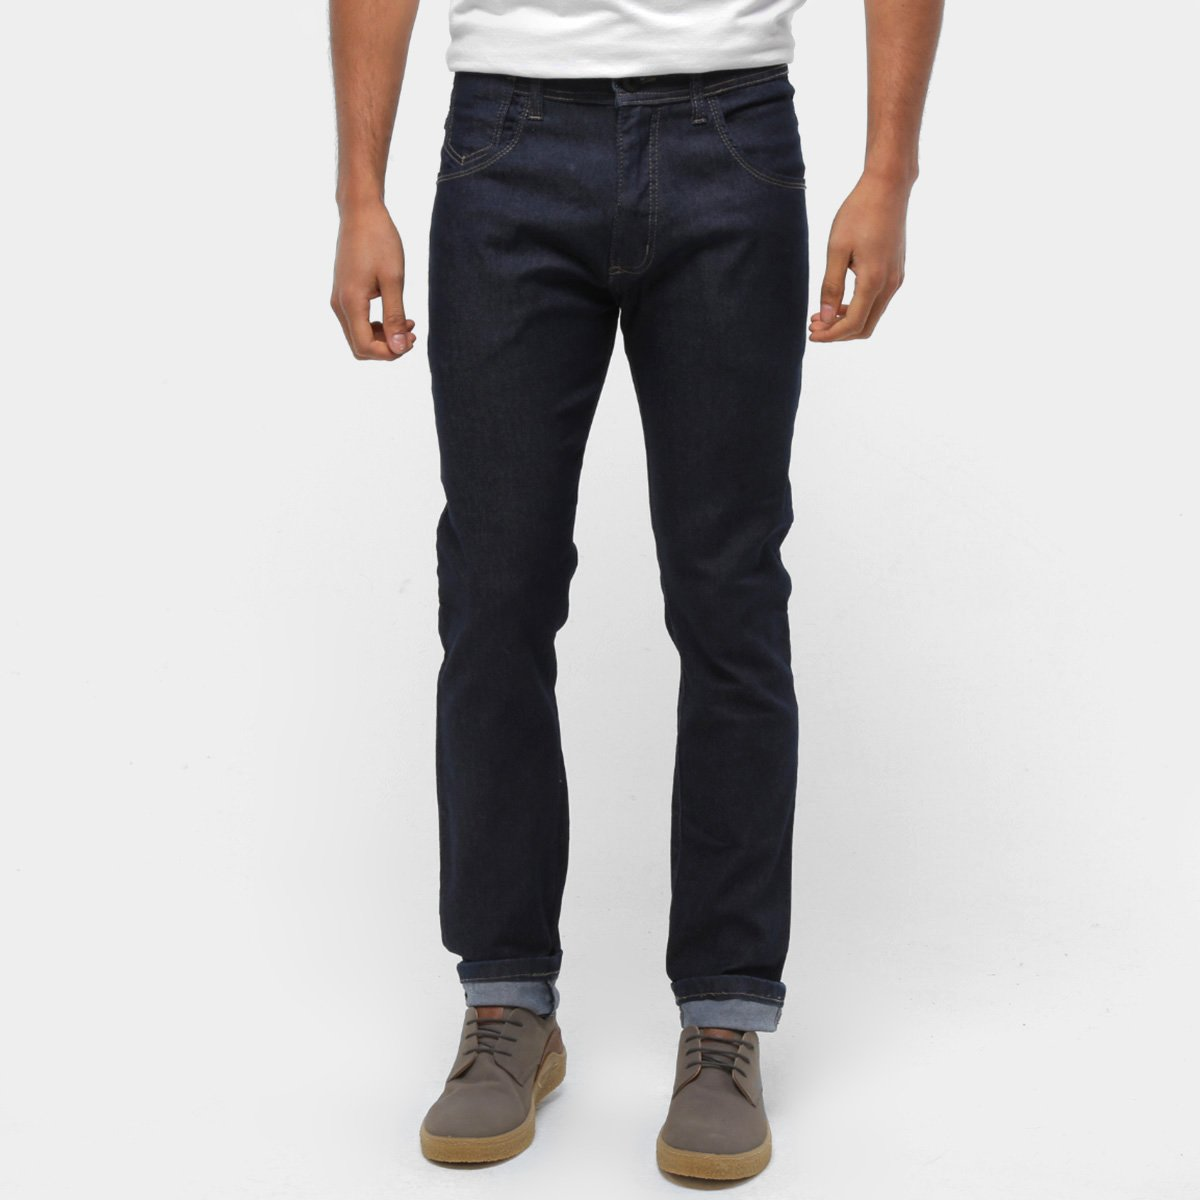 Calça Hd Jeans Slim Fit Lisa Masculina